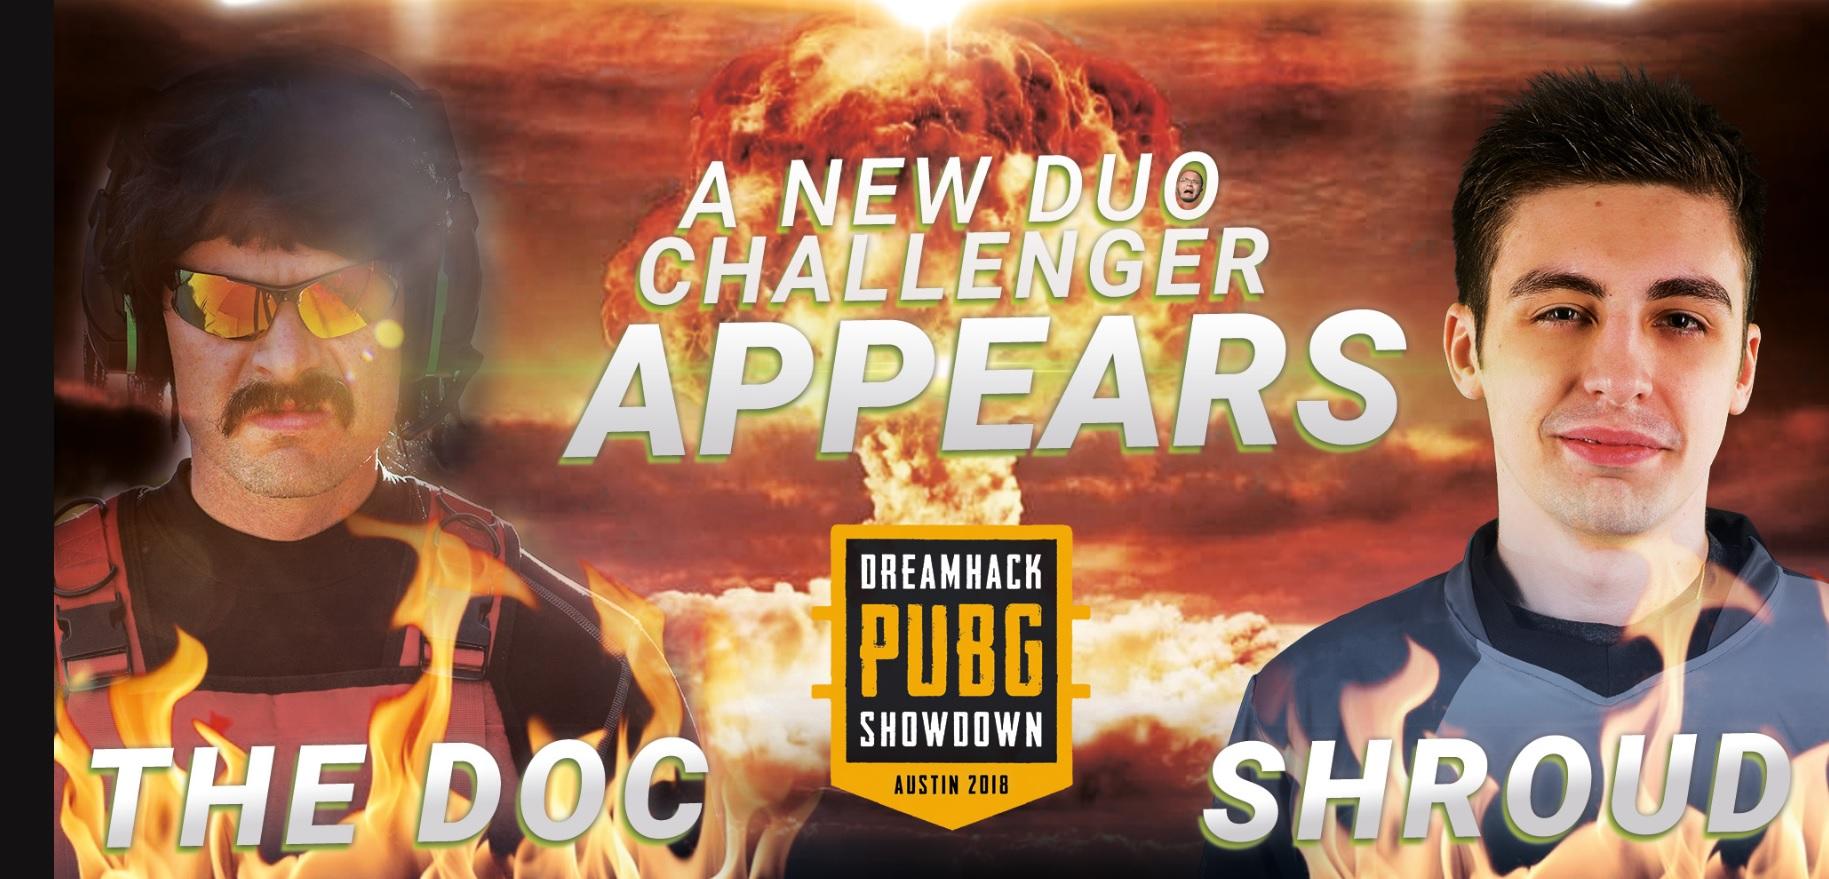 DreamHack 2018 Duo